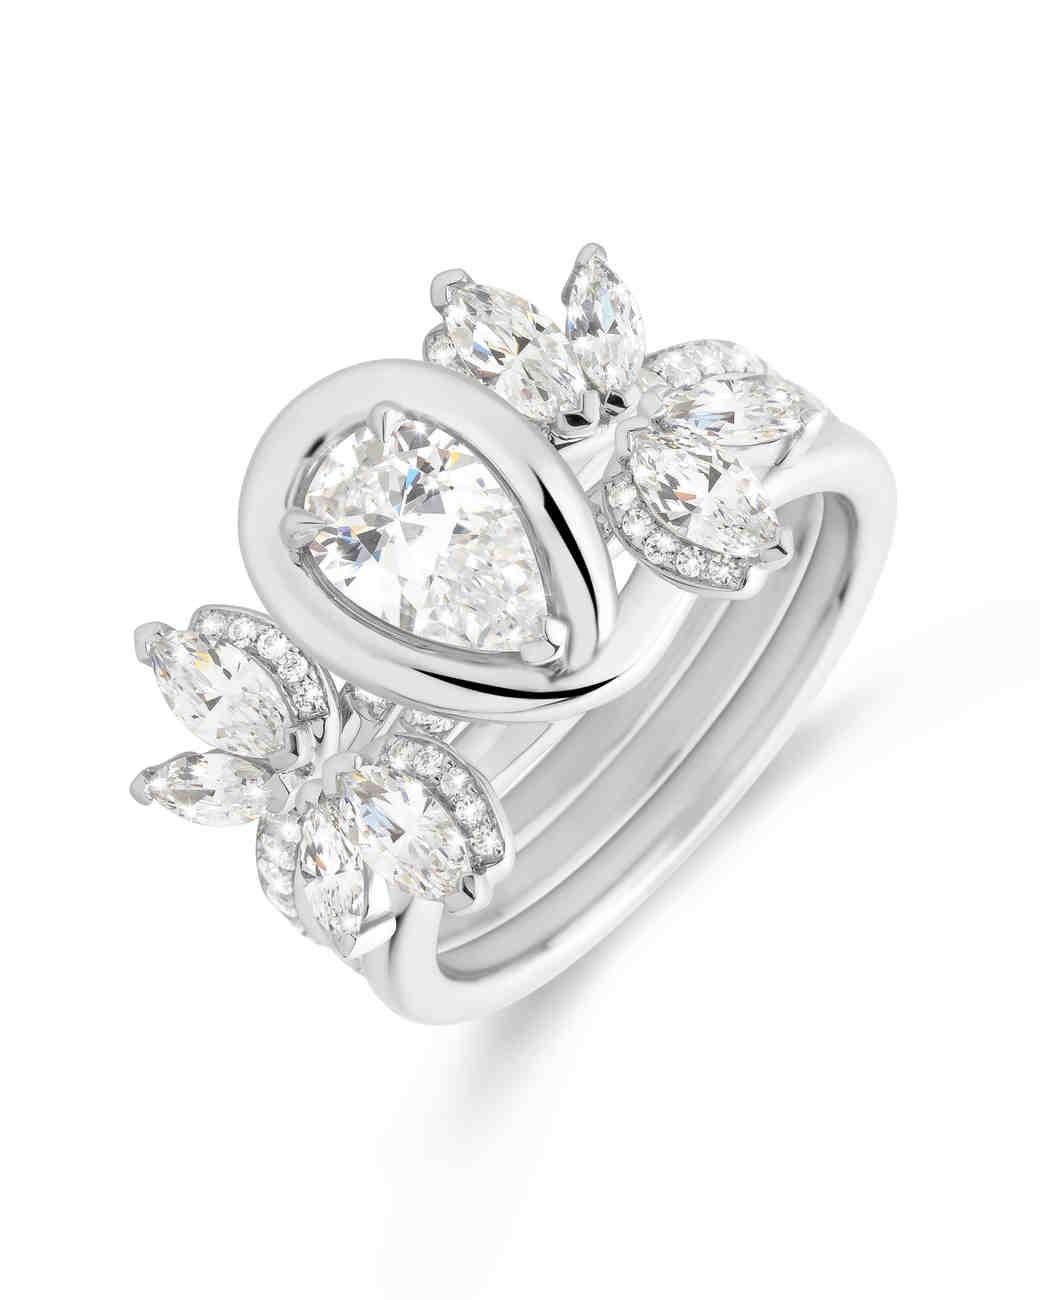 engagement-ring-designers-laurence-bruyninckx-ring-0615.jpg